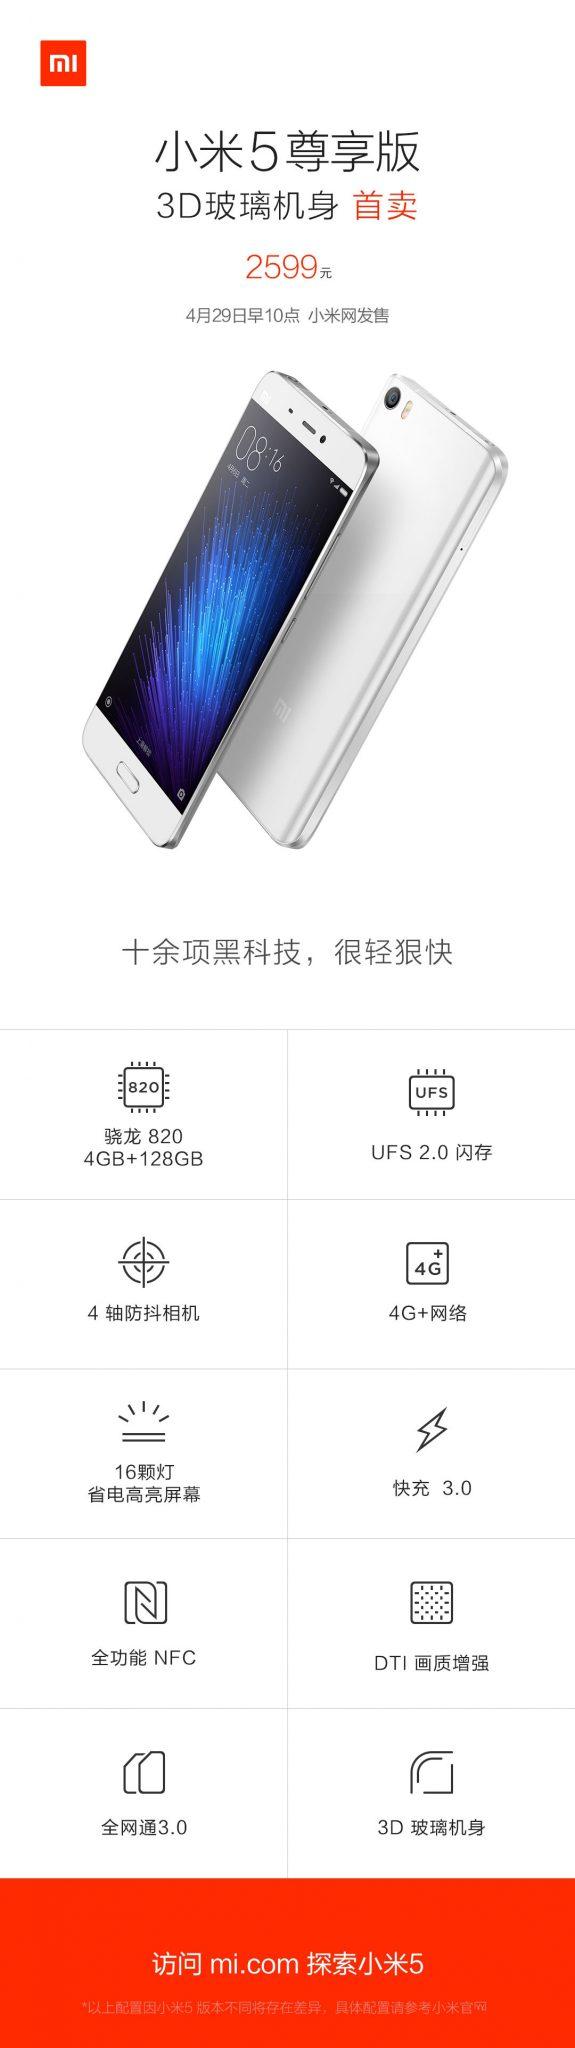 xiaomi-mi5-pro-biele3